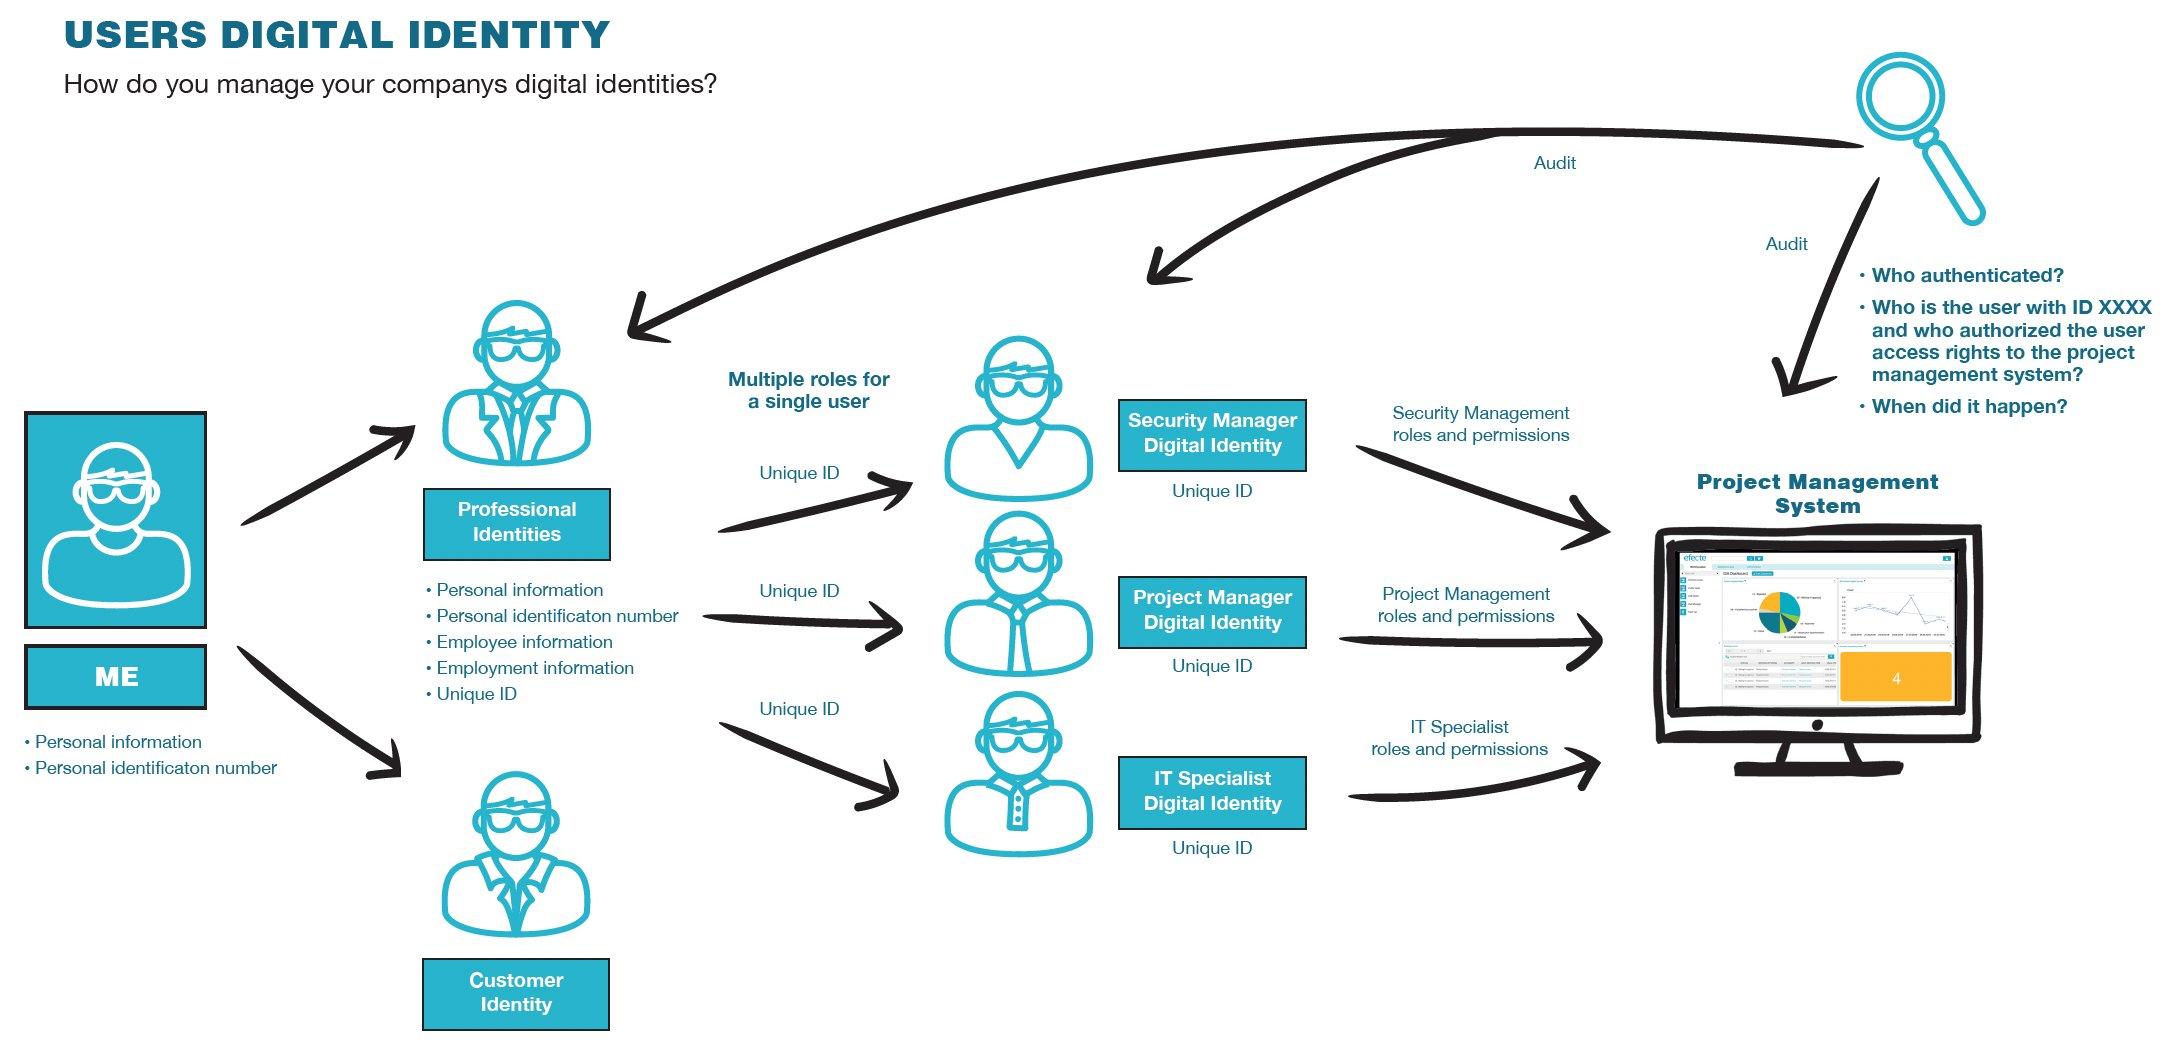 Users Digital Identity